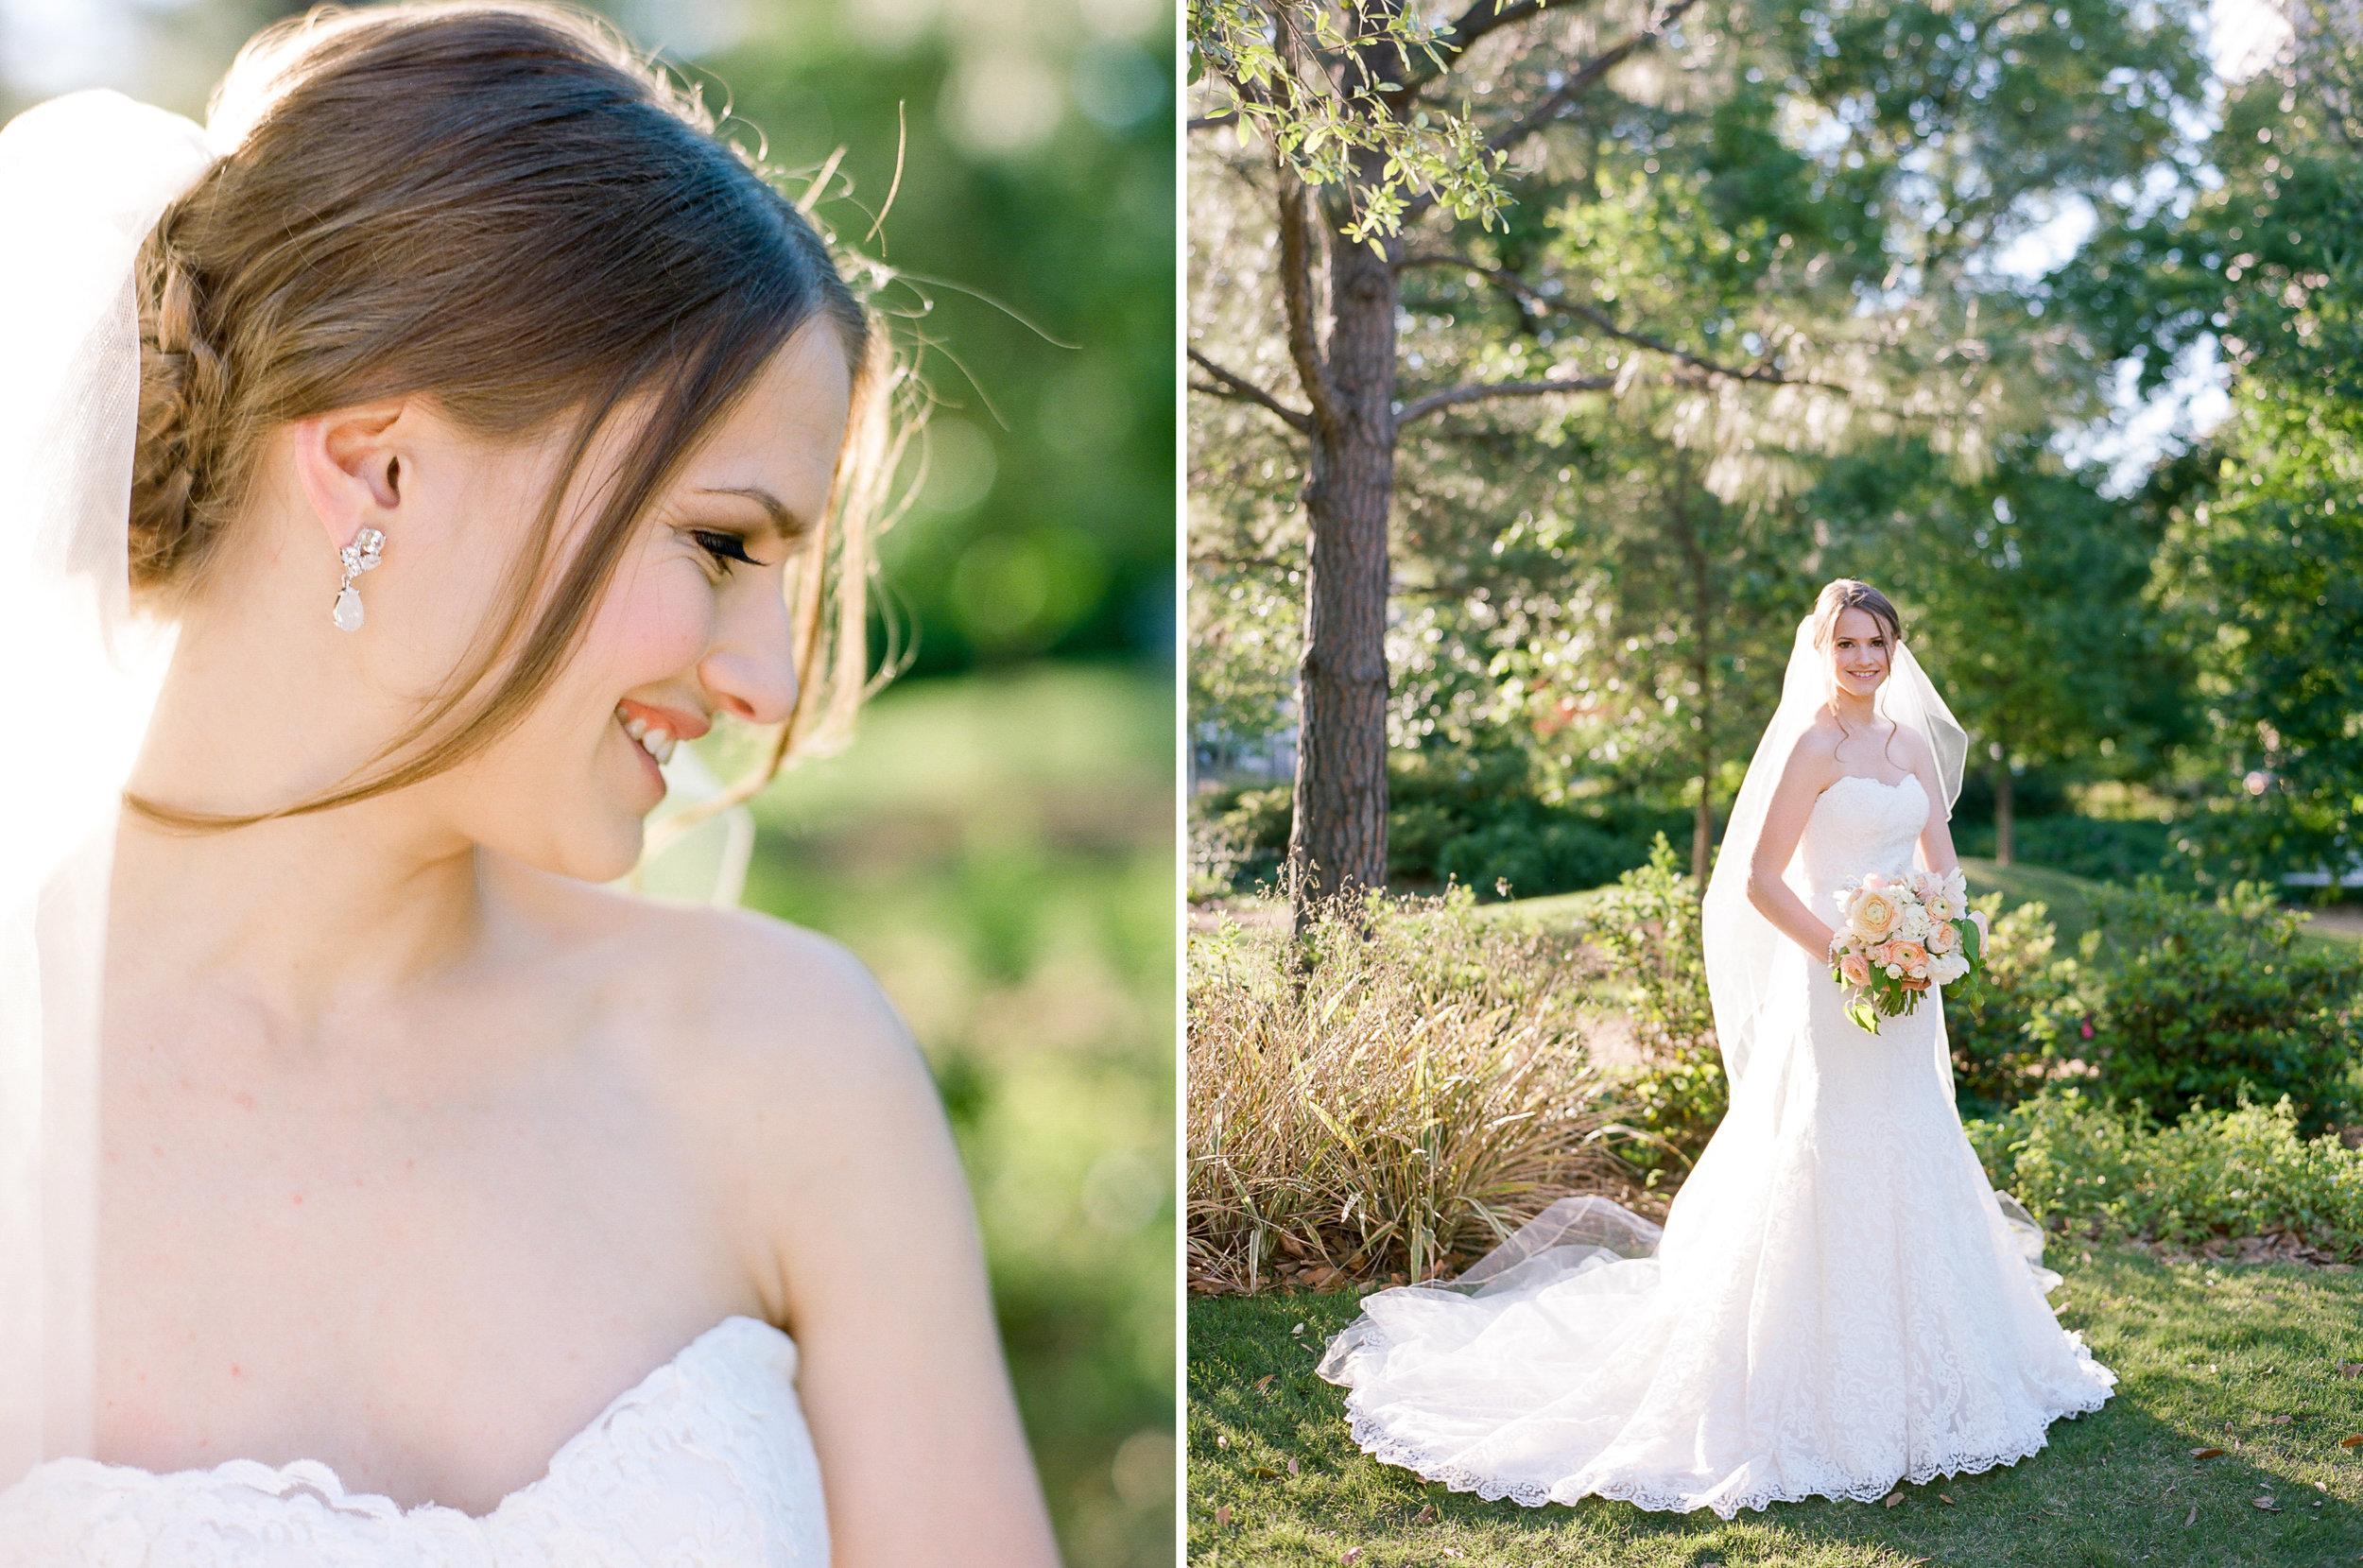 Houston-Wedding-Photographer-Film-Fine-Art-Bridals-Dana Fernandez-Photography-108.jpg